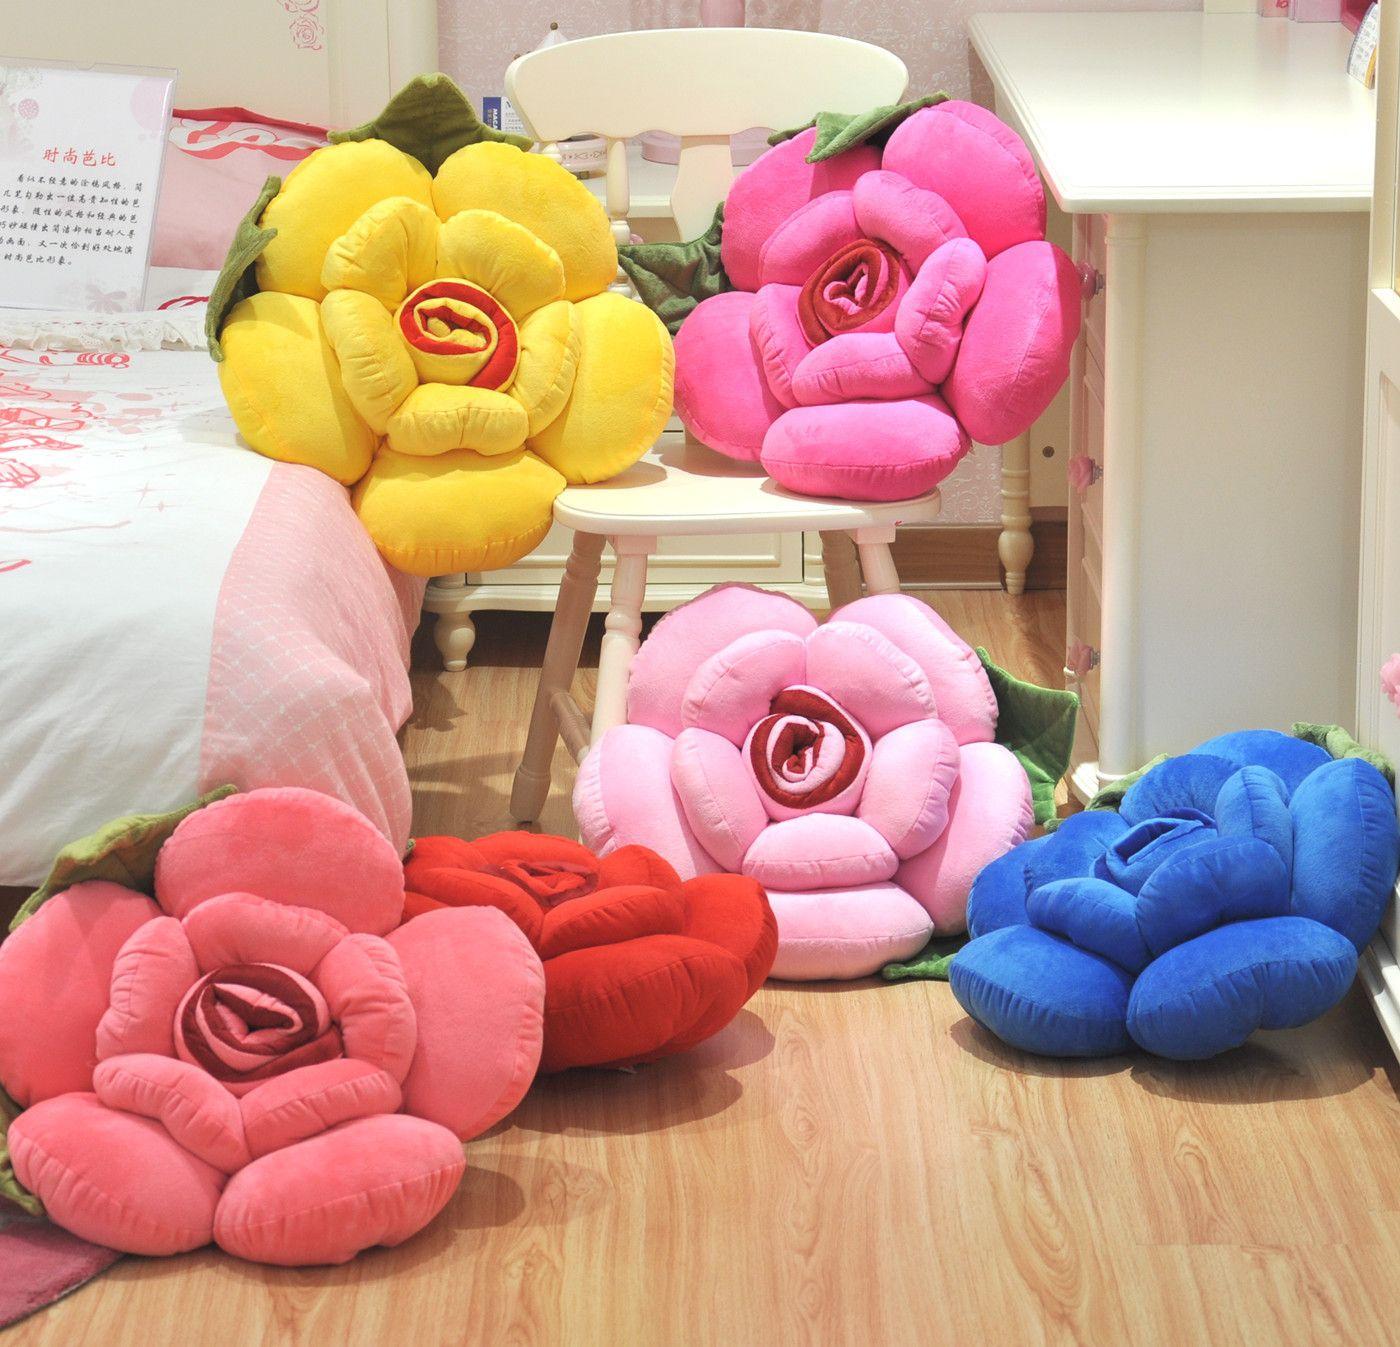 Rabbit Large rose pillow back cushion plush toy pillow birthday ...